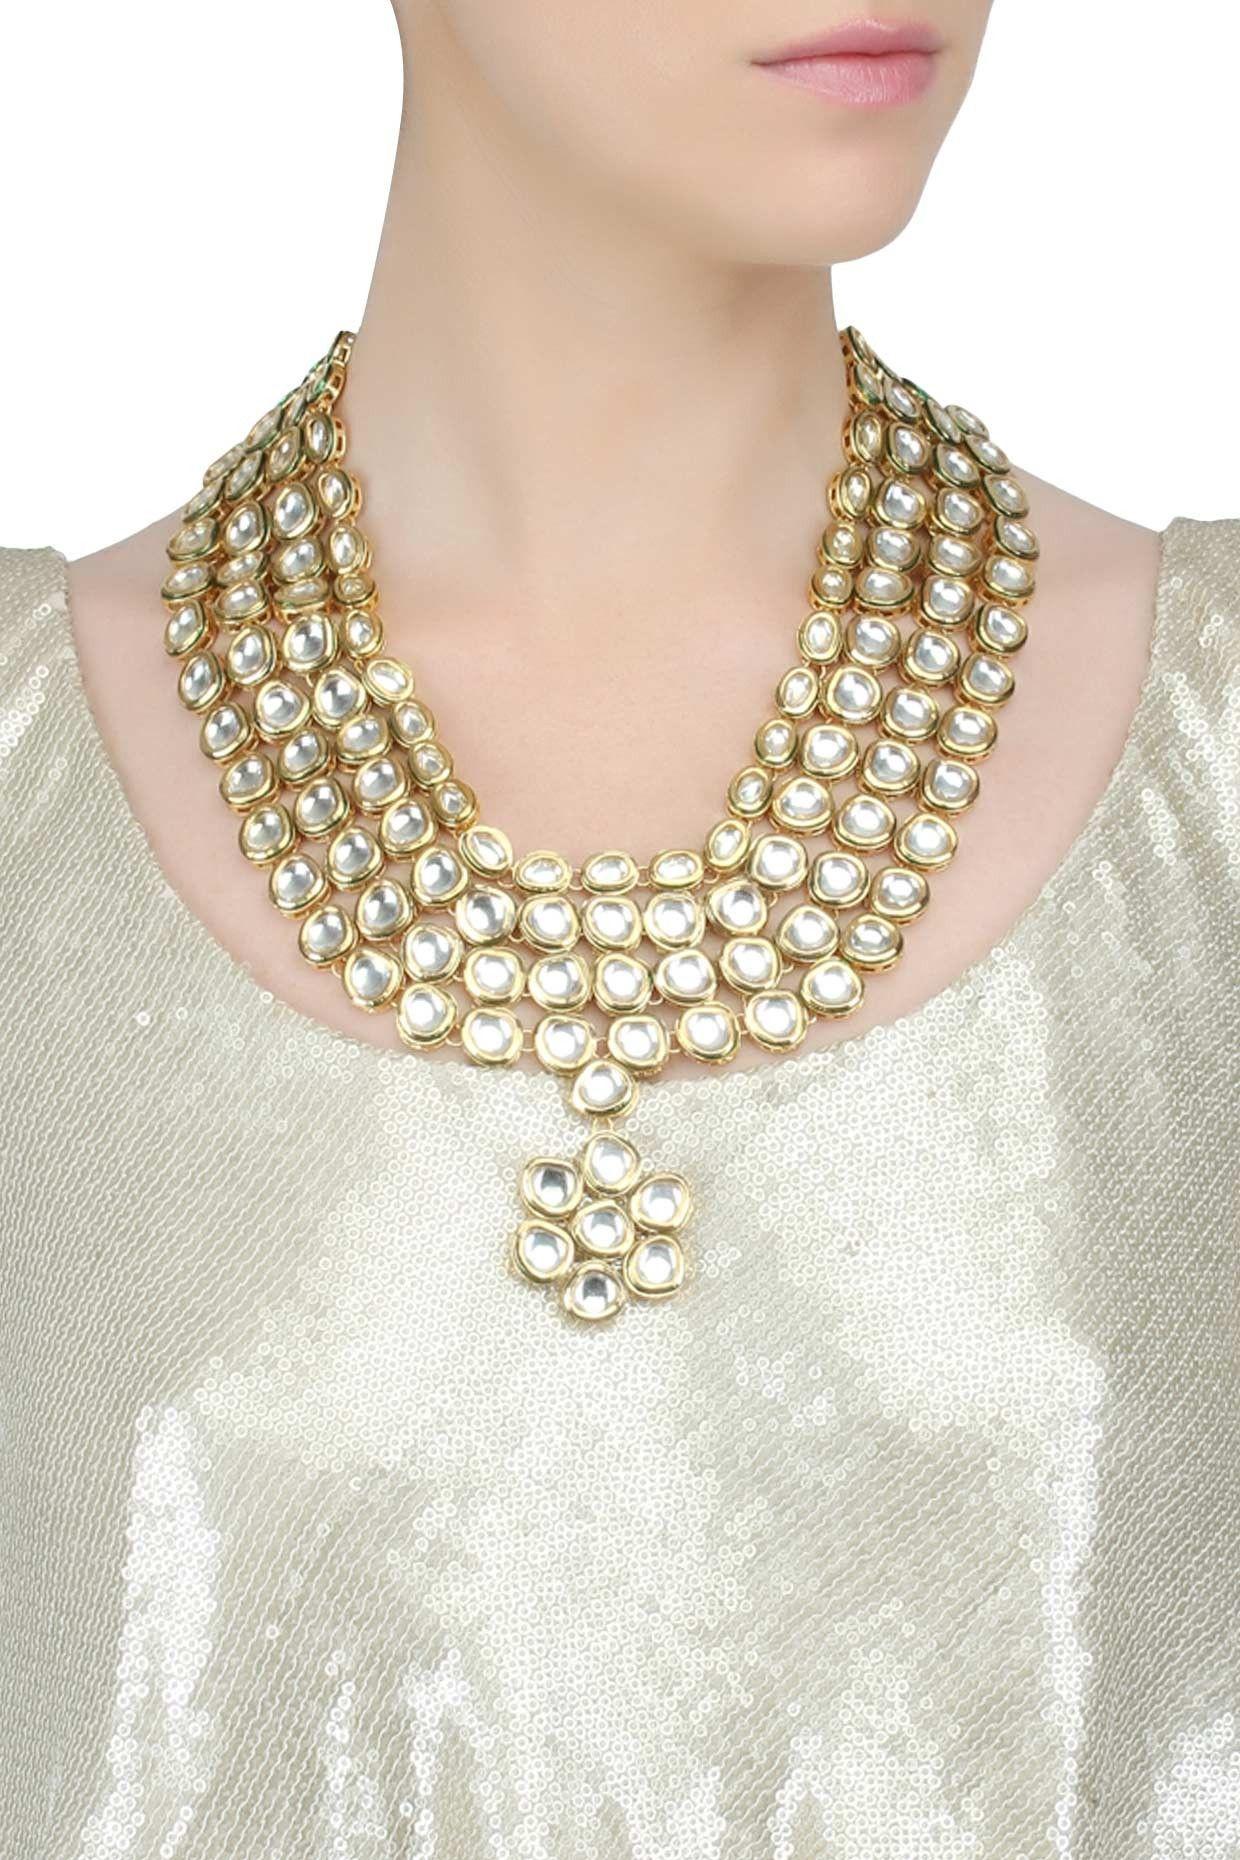 OSR Jewellers Gorgeous Jewelry Pinterest